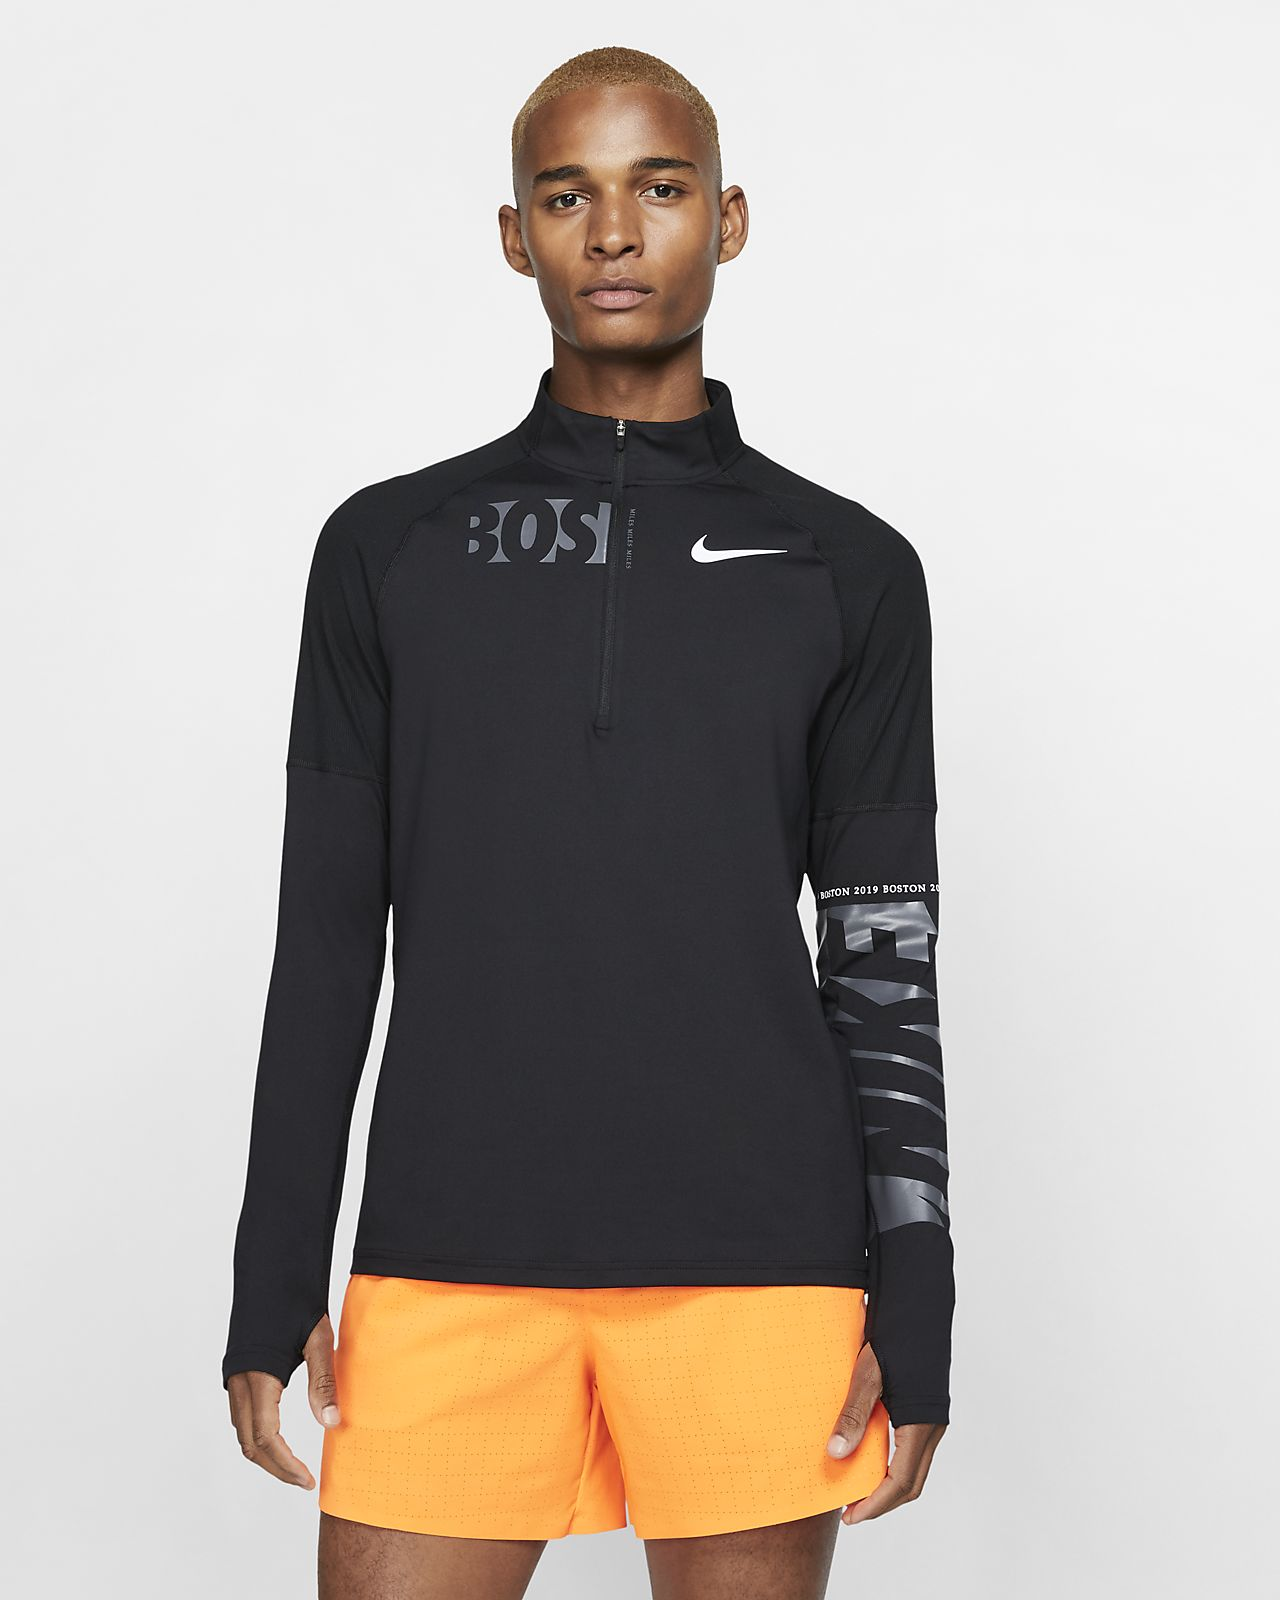 6a584814483b Nike Dri-FIT Element (Boston 2019) Men s 1 2-Zip Running Top. Nike.com